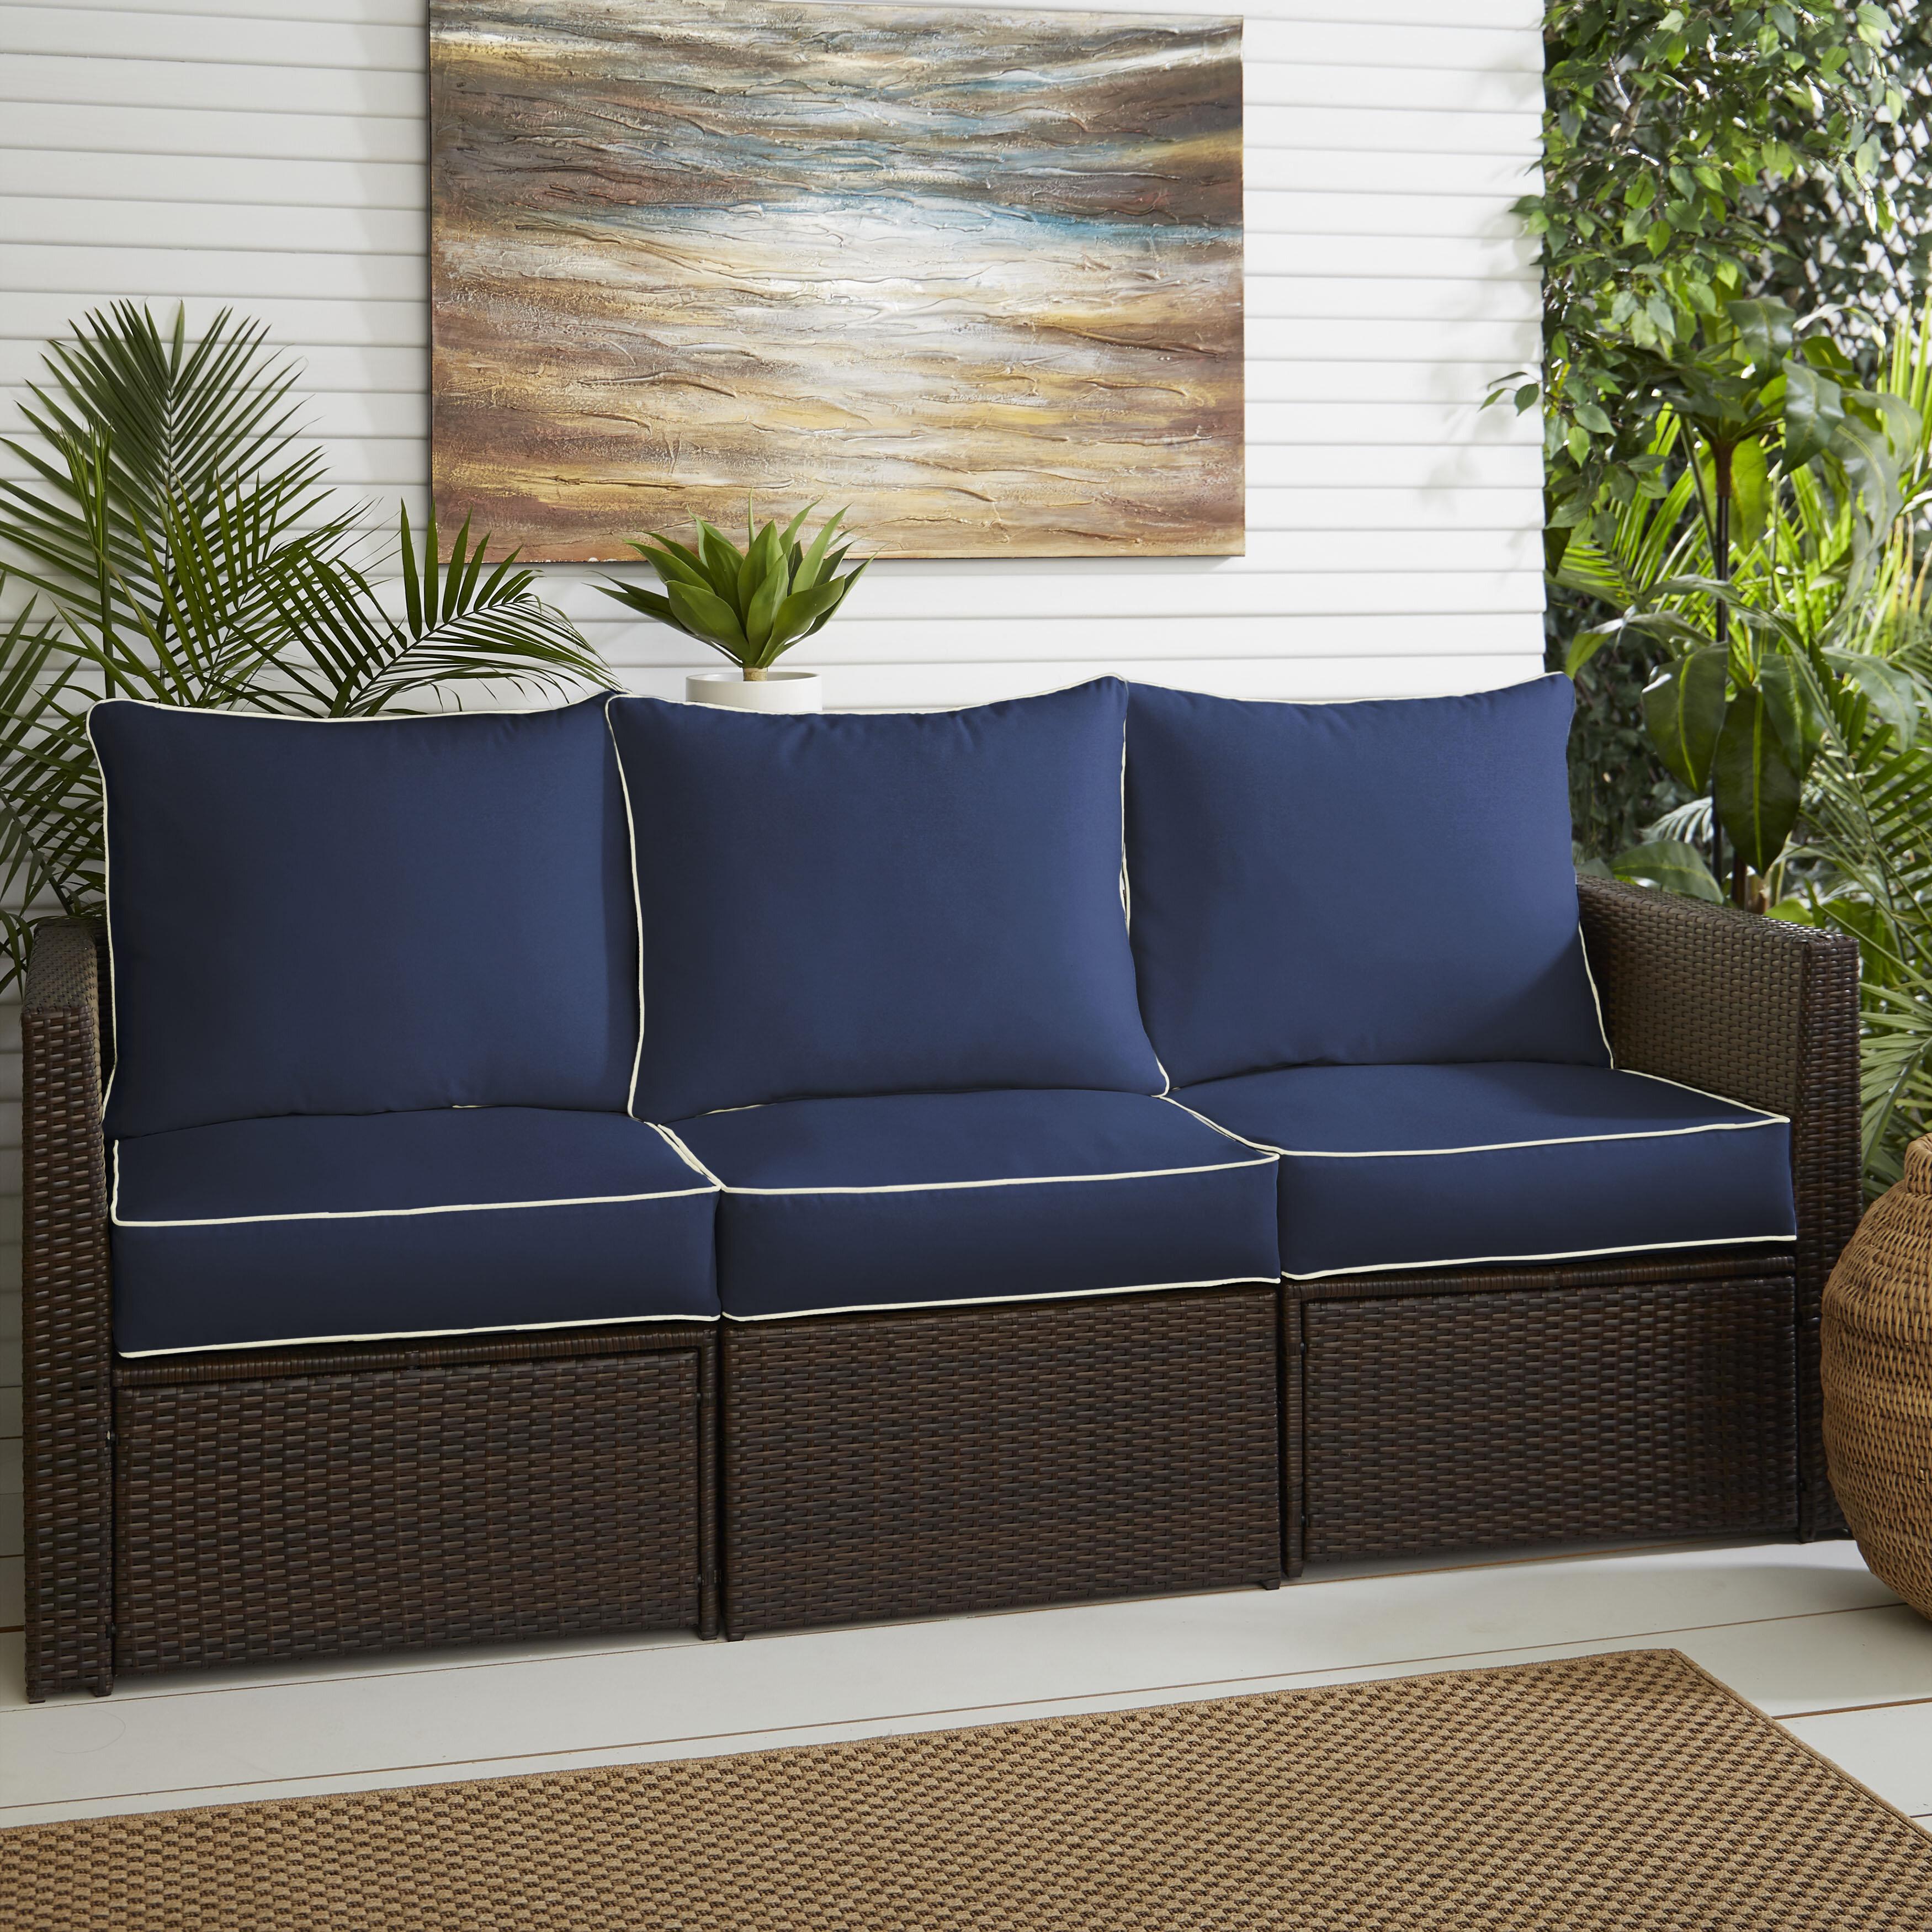 Ginsberg Indoor/Outdoor Sunbrella Sofa Cushion & Reviews | Birch Lane